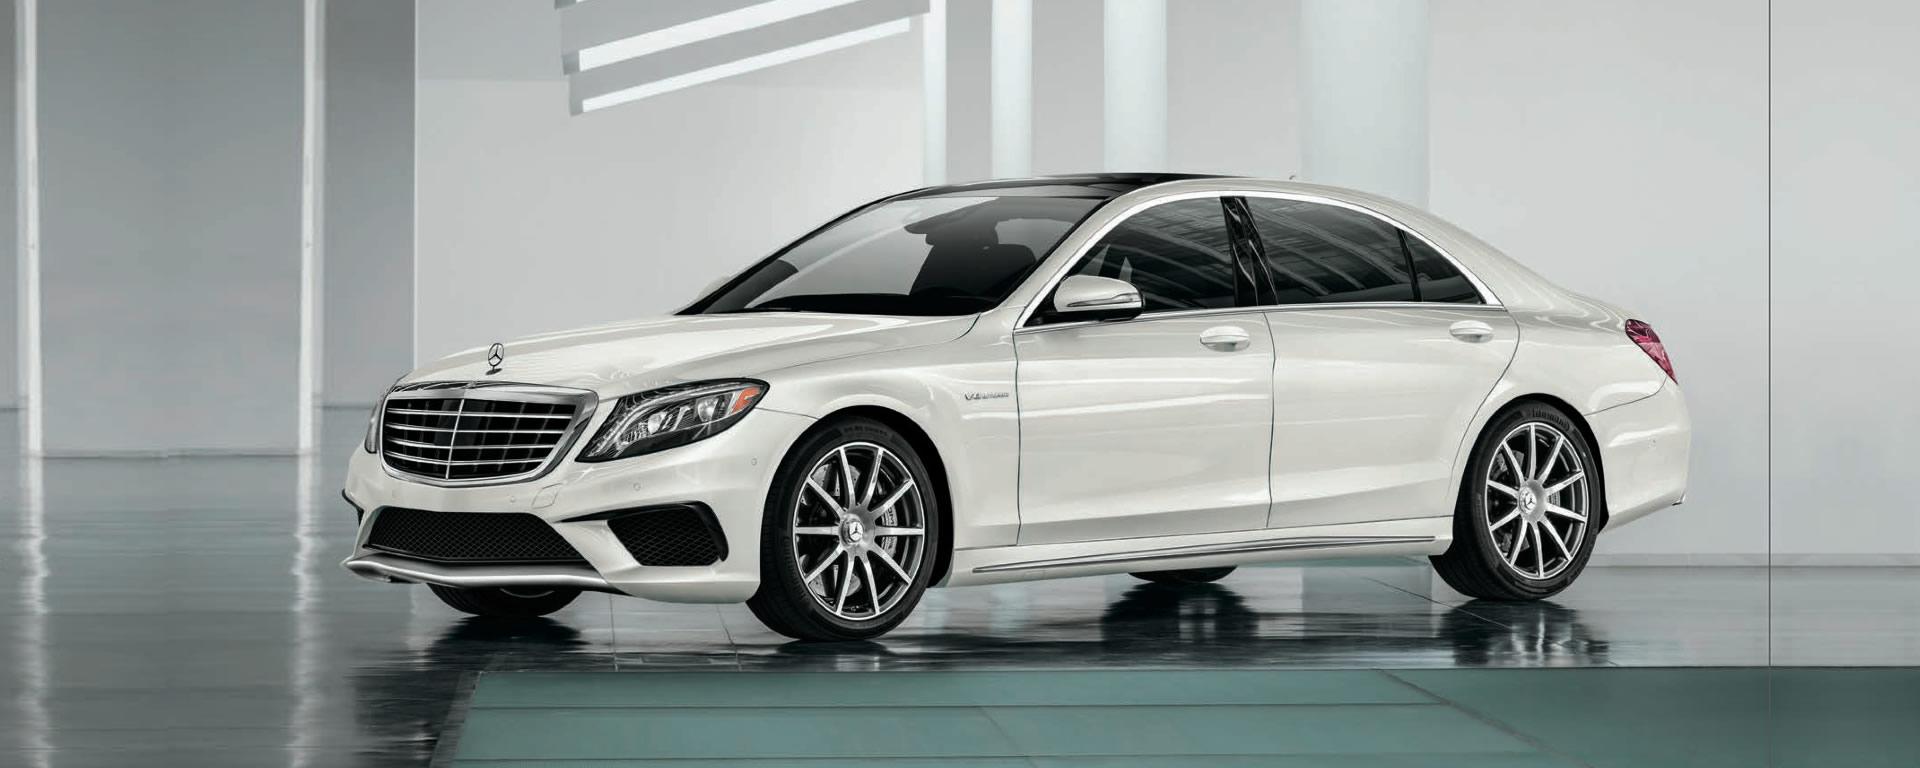 2014 Mercedes-Benz White S-Class